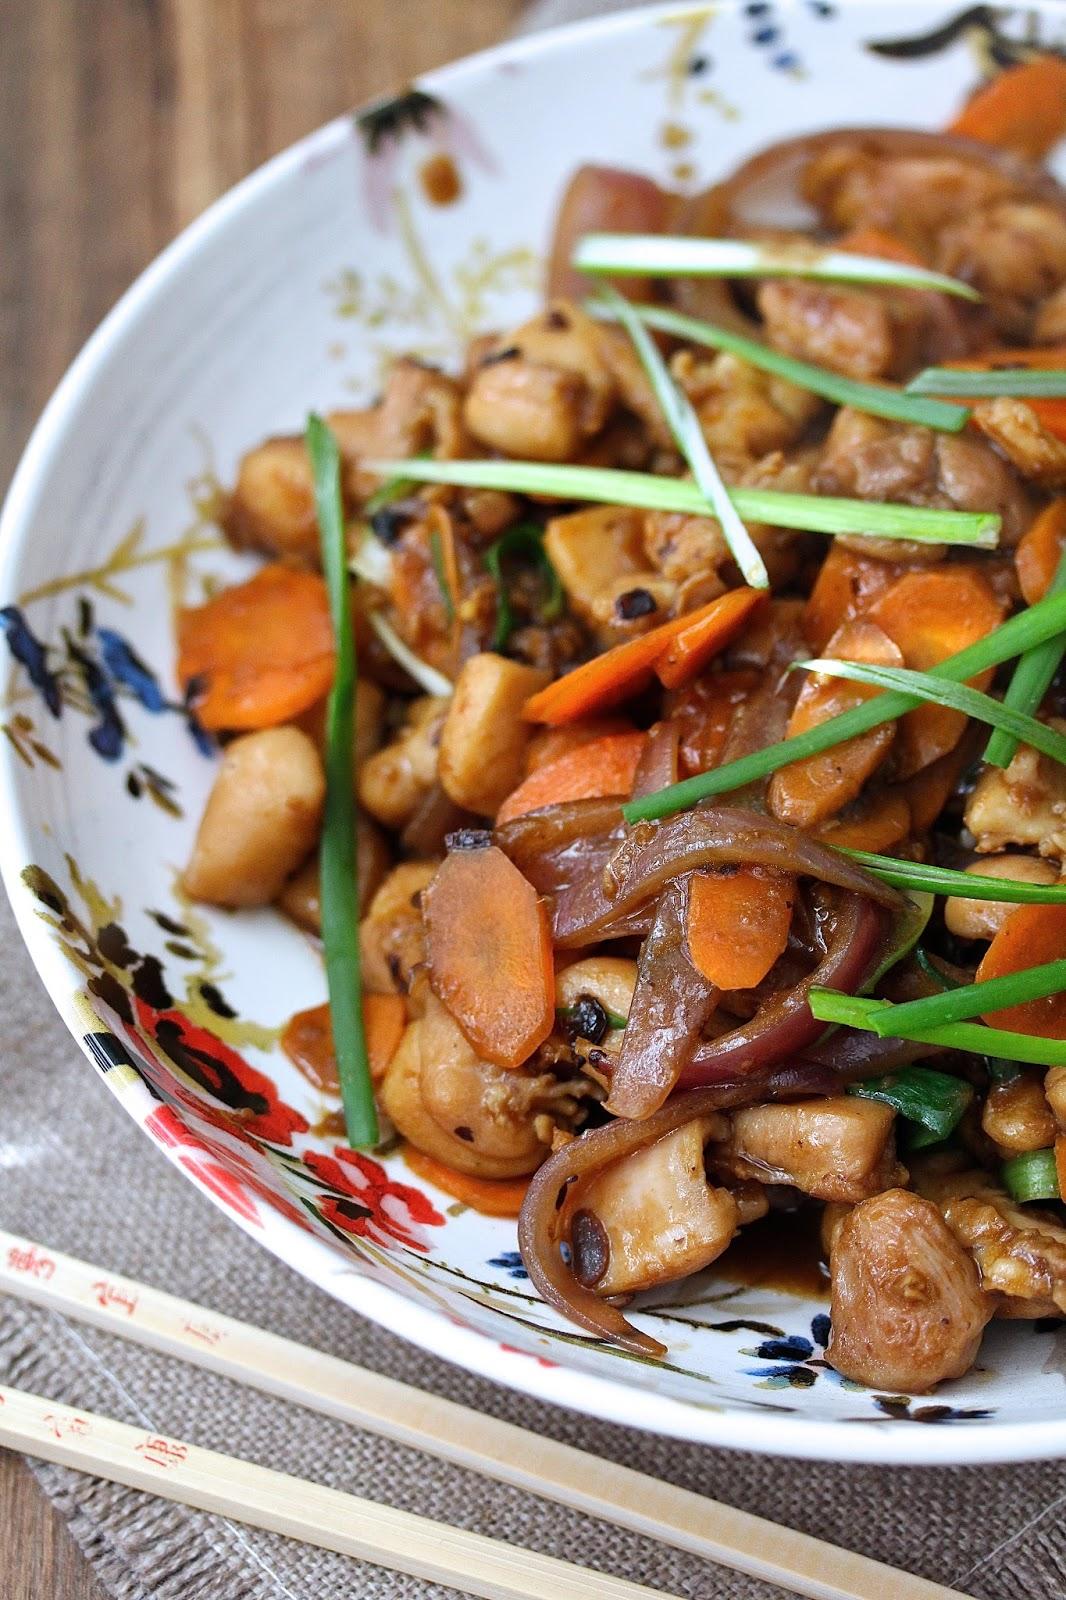 how to prepare my wok